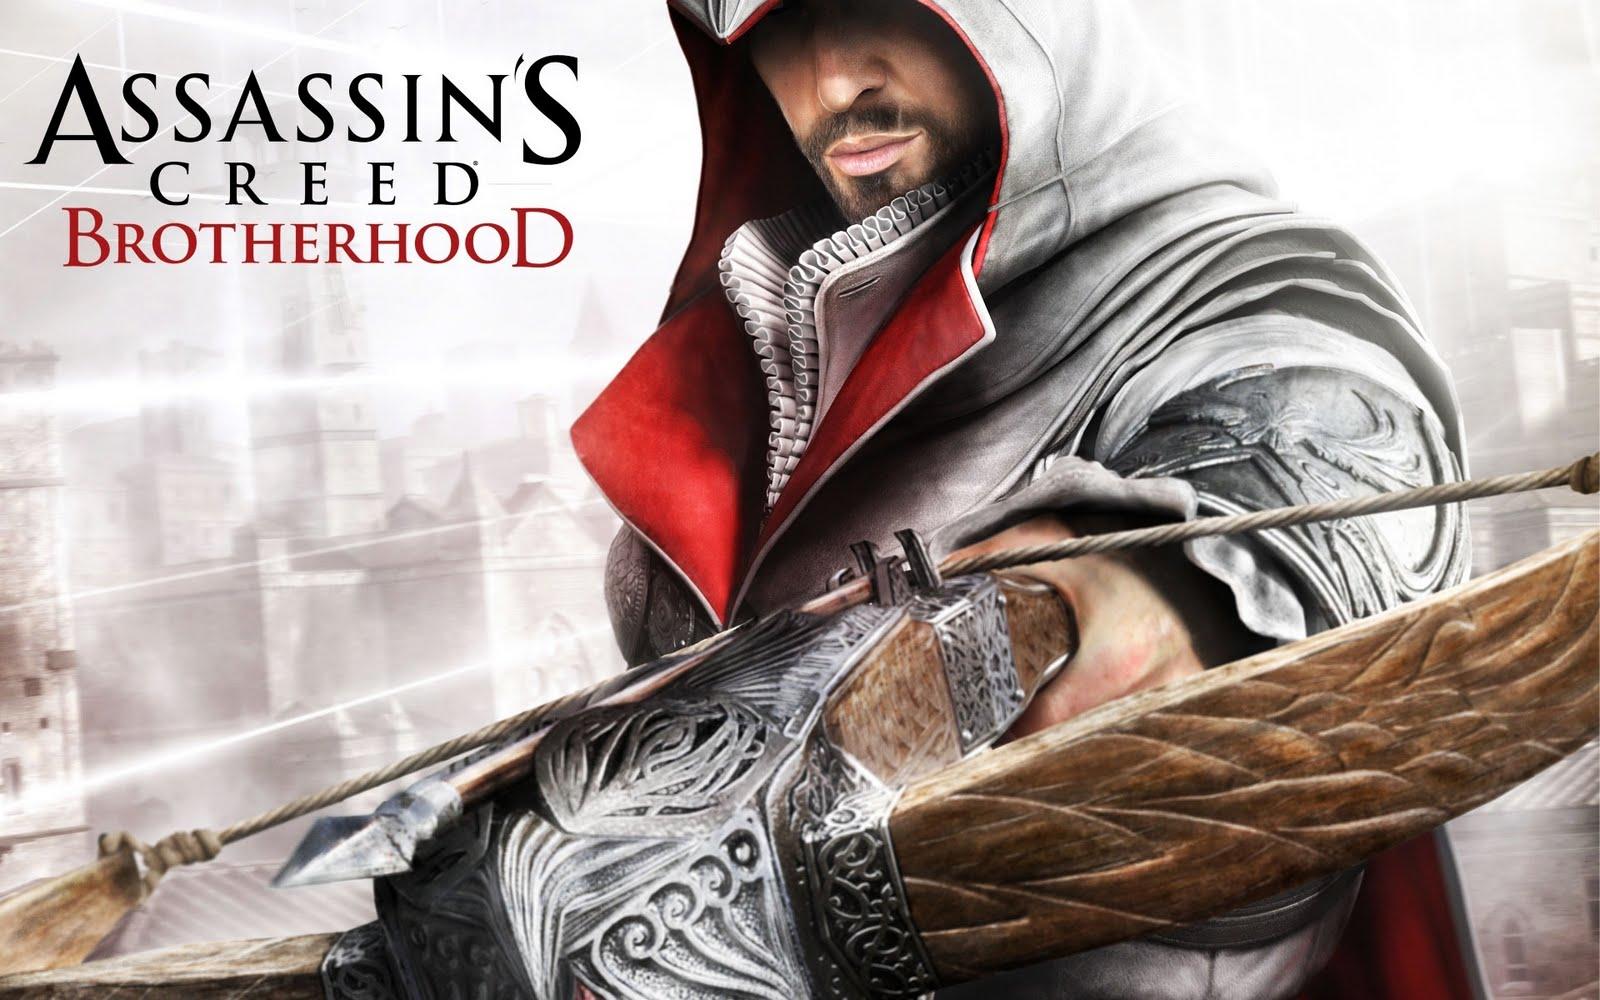 http://3.bp.blogspot.com/-64c_bKrRgUQ/TYjYzTw3sOI/AAAAAAAAANI/f8zlRJagKWU/s1600/Assassins-Creed-Brotherhood-wallpaper.jpg